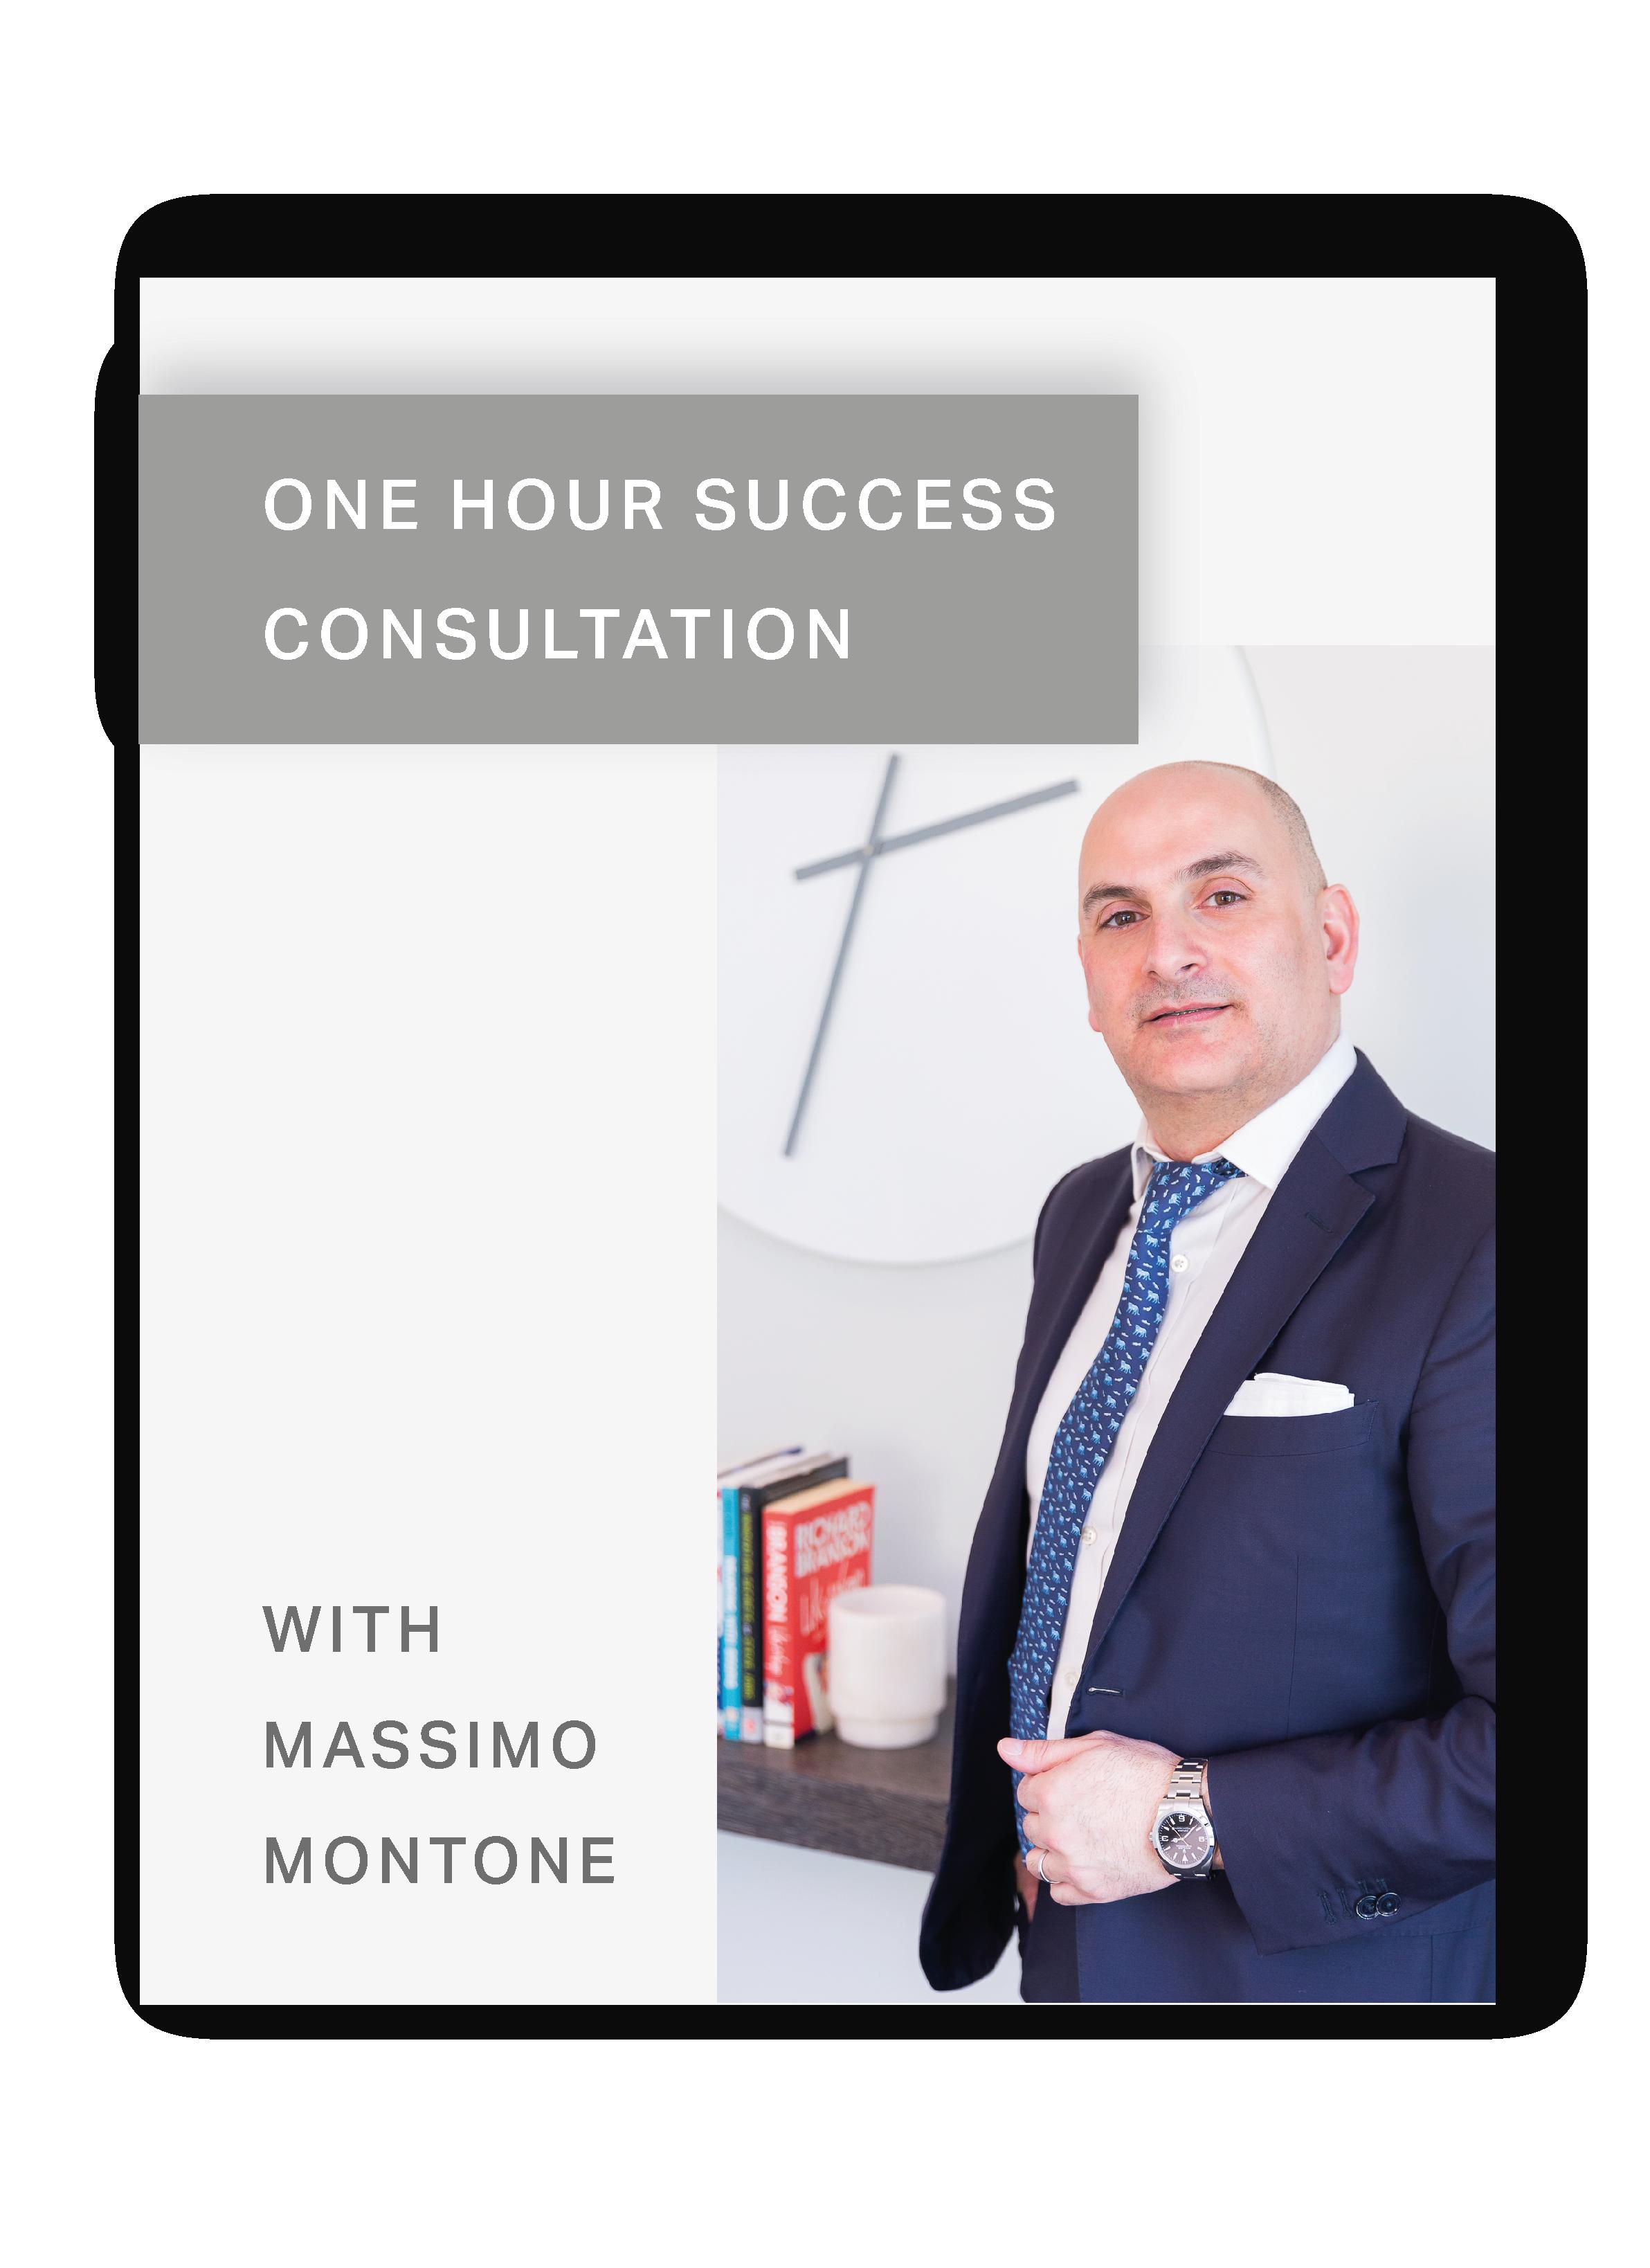 One Hour Consultation with Massimo Montone | Restaurant Keys